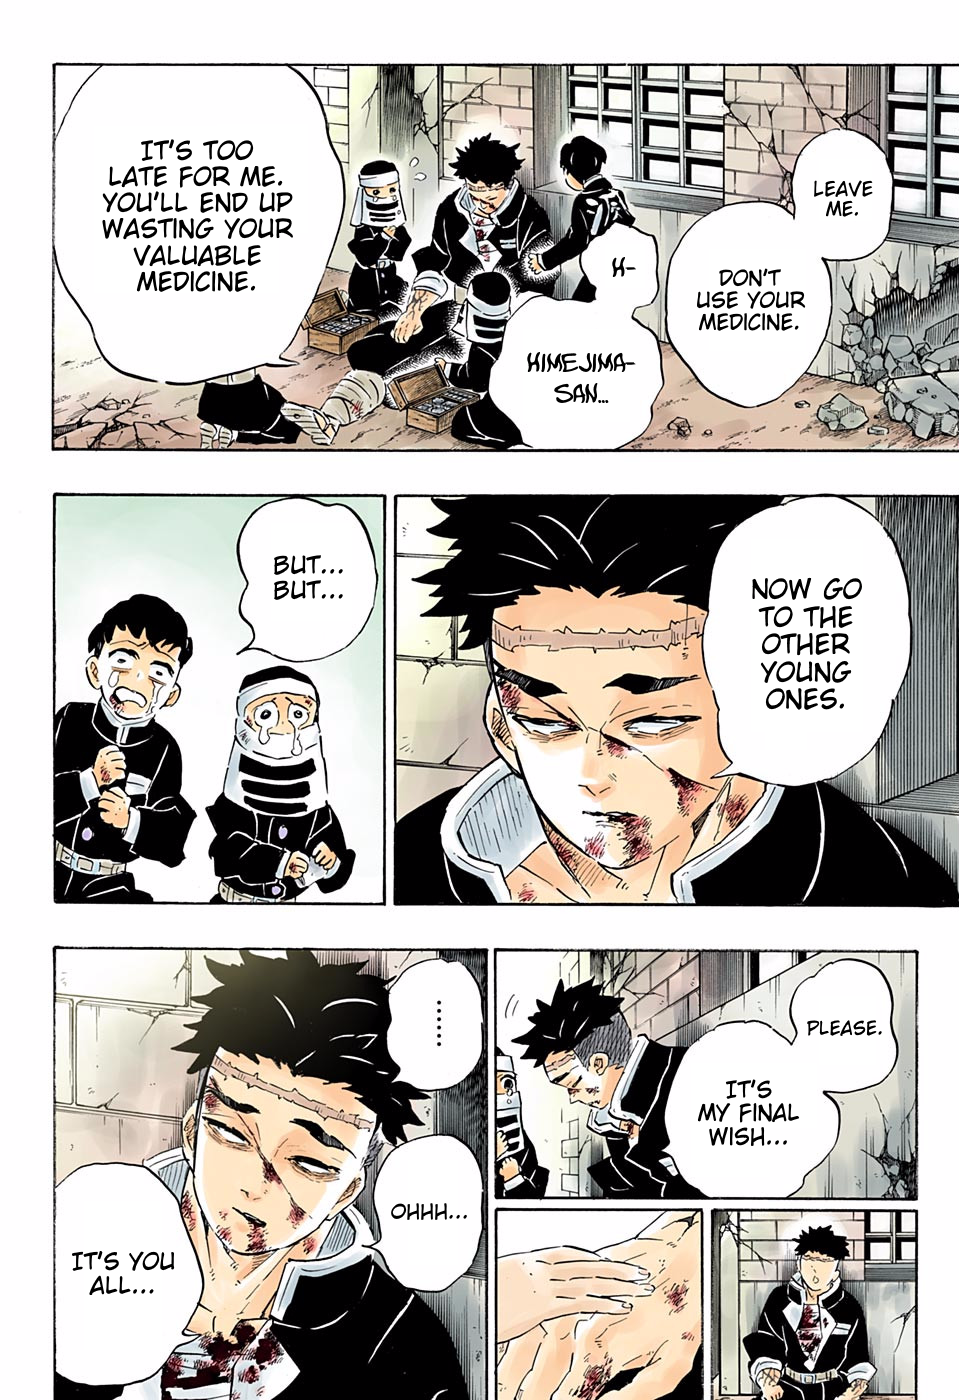 Kimetsu no Yaiba Digital Colored Comics Chapter 200 in